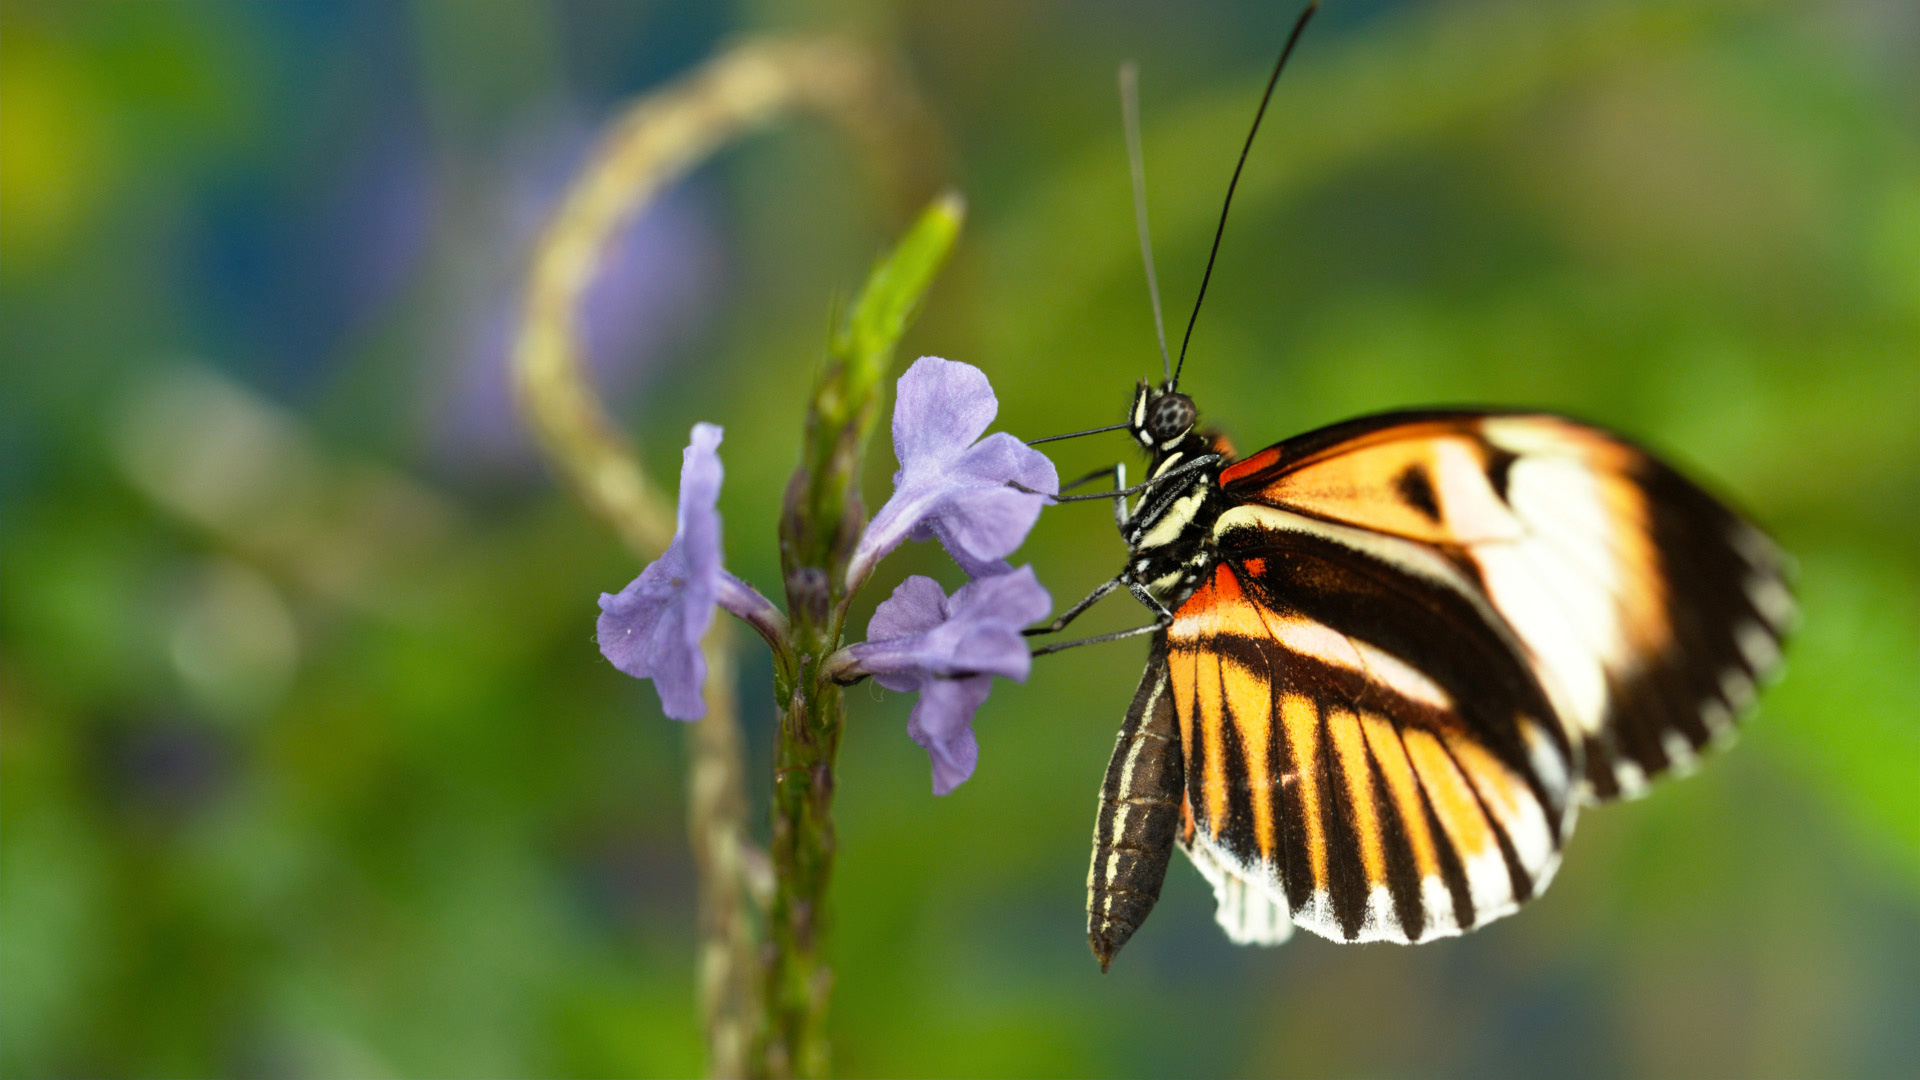 Sex, Lies and Butterflies | About | Nature | PBS